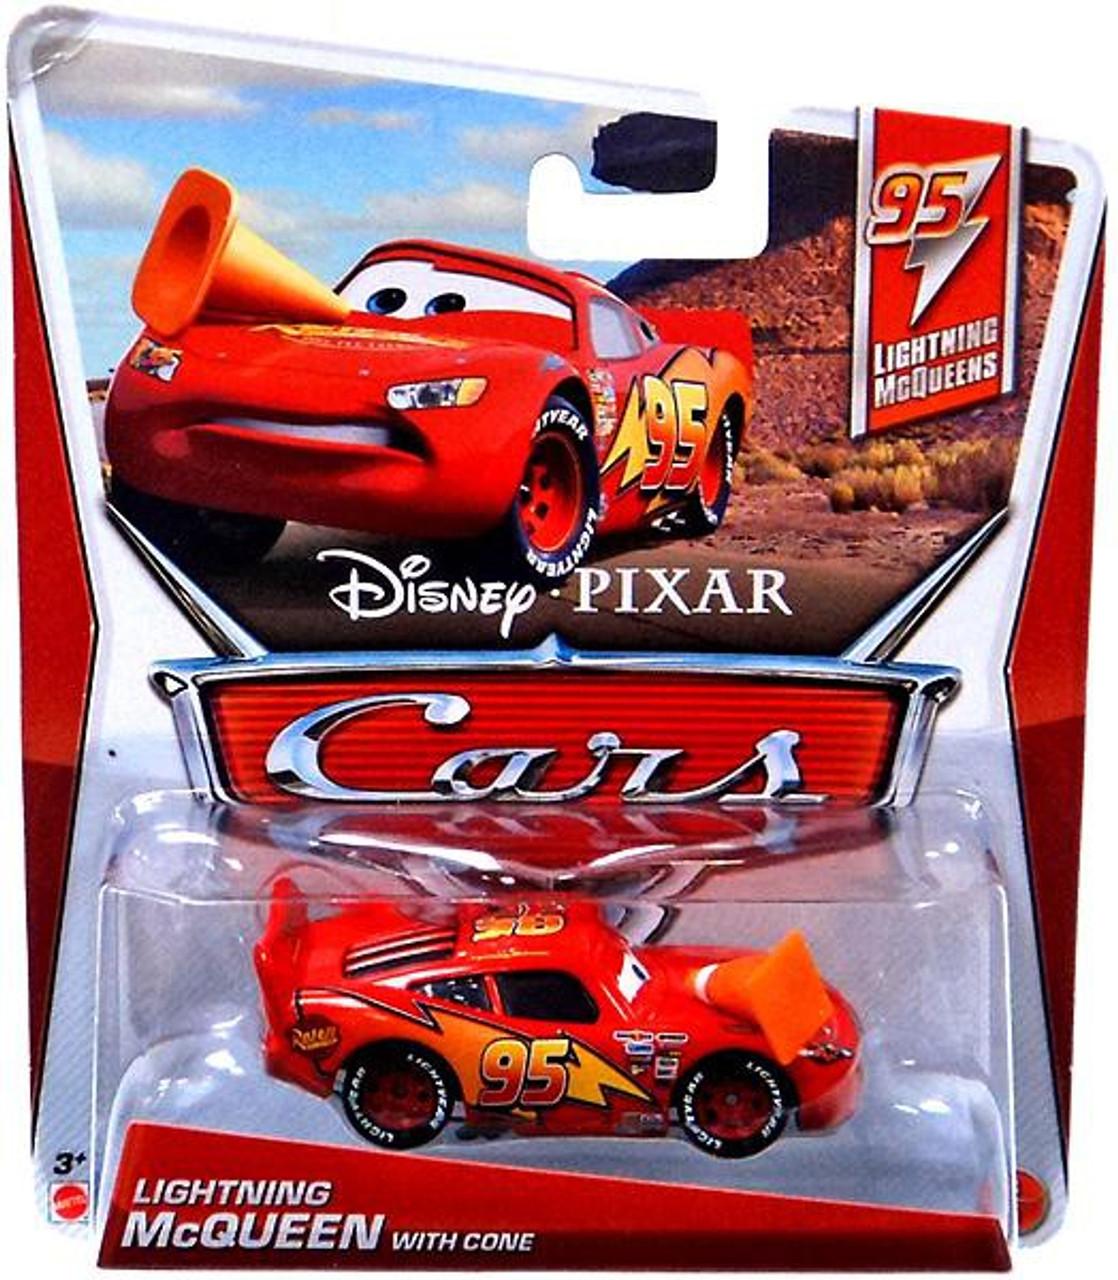 Disney Pixar Cars Series 3 Lightning Mcqueen With Cone 155 Diecast